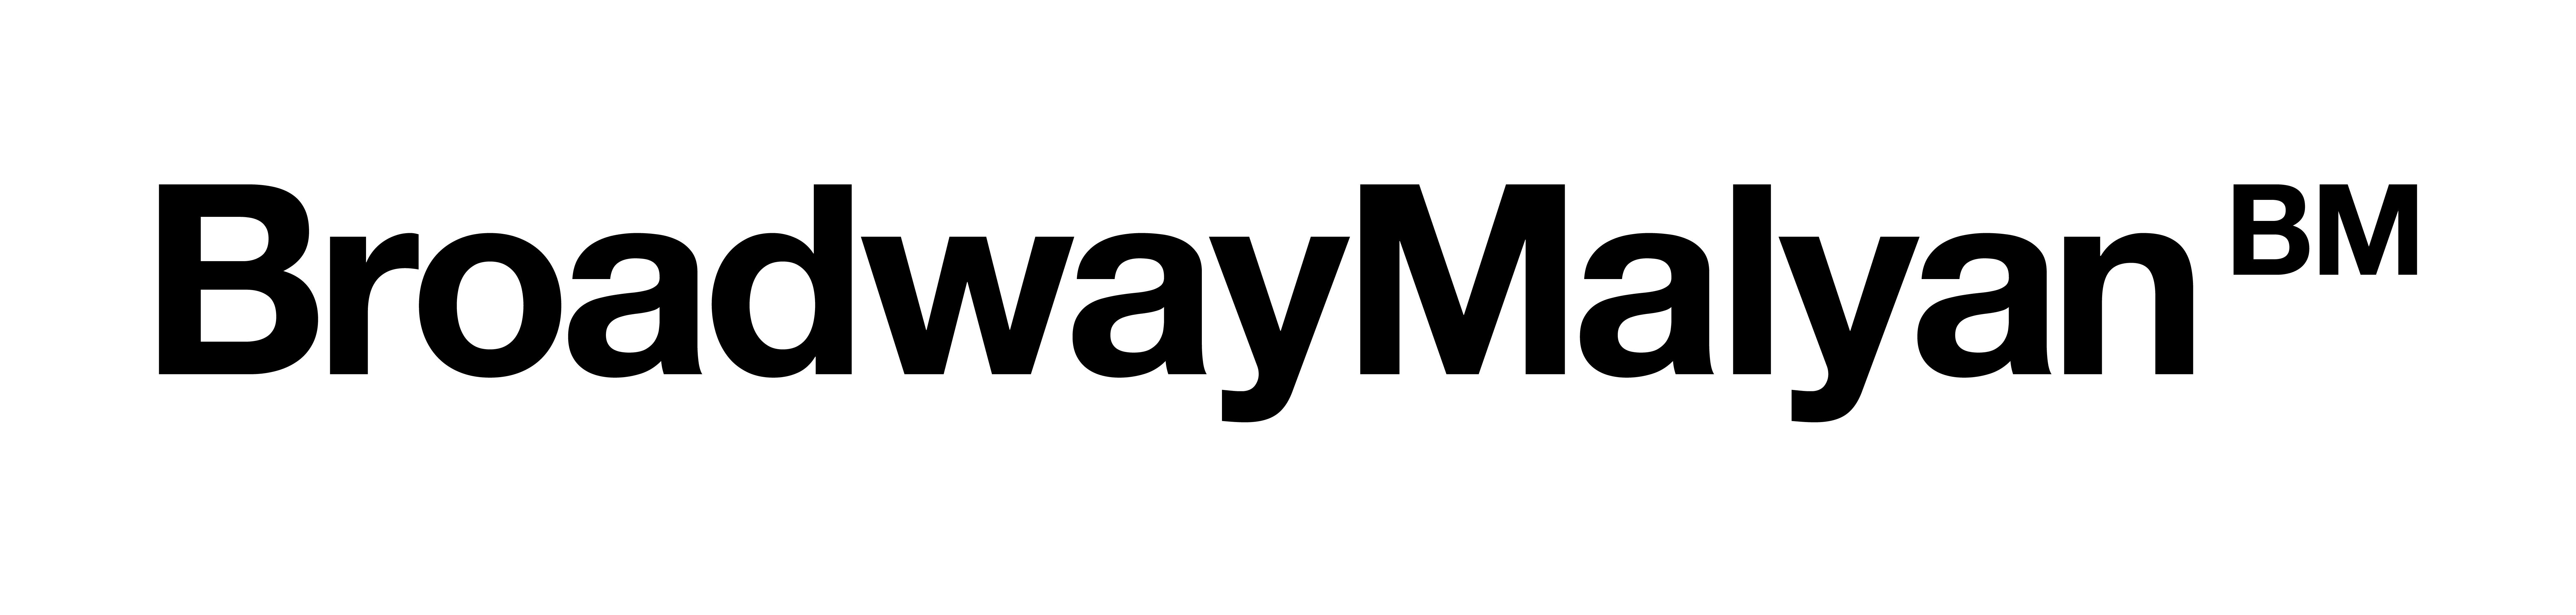 BroadwayMalyan